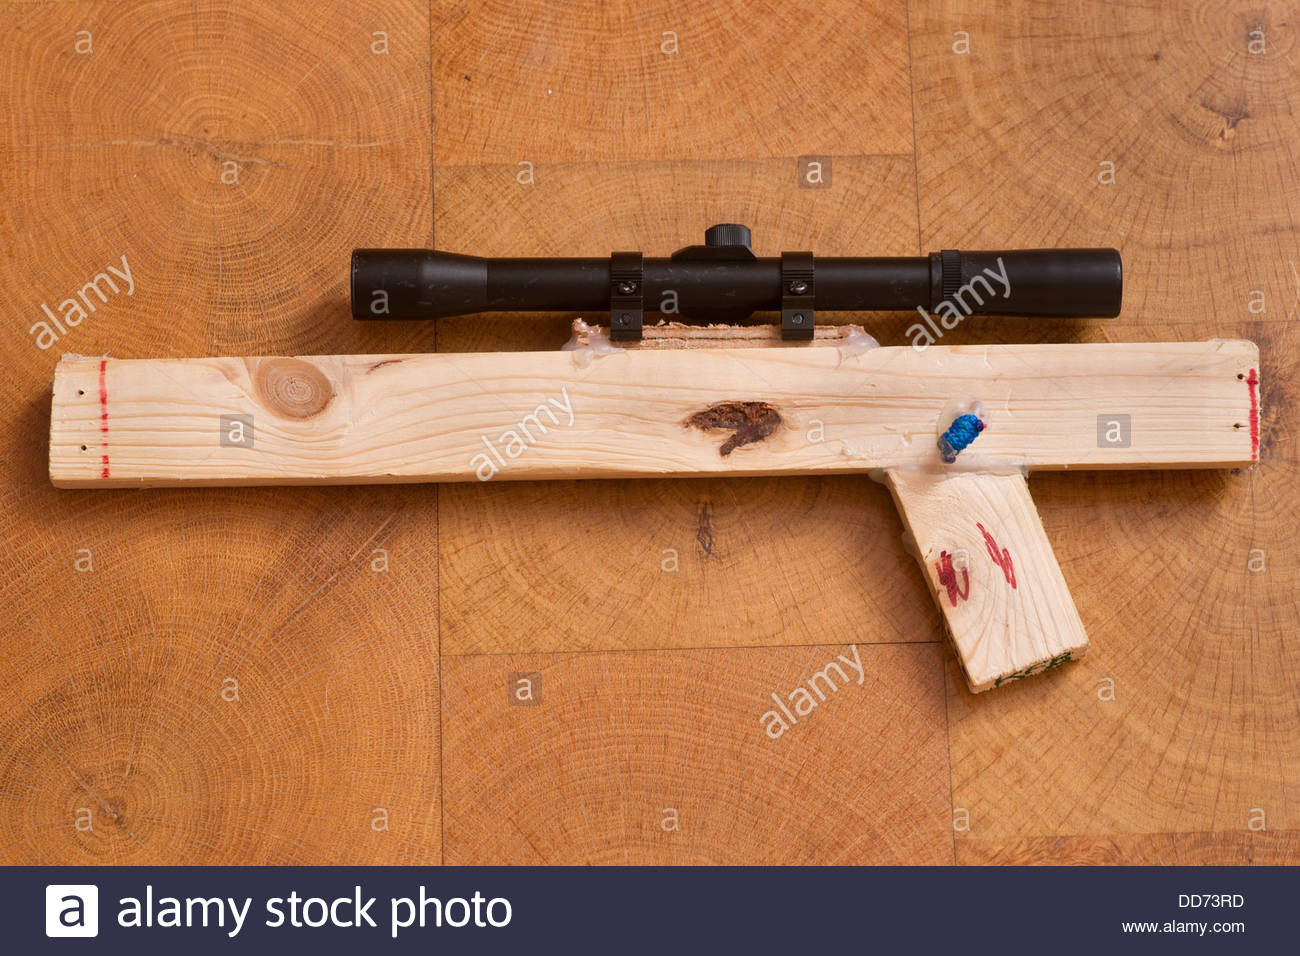 Toy Sniper Gun Scope